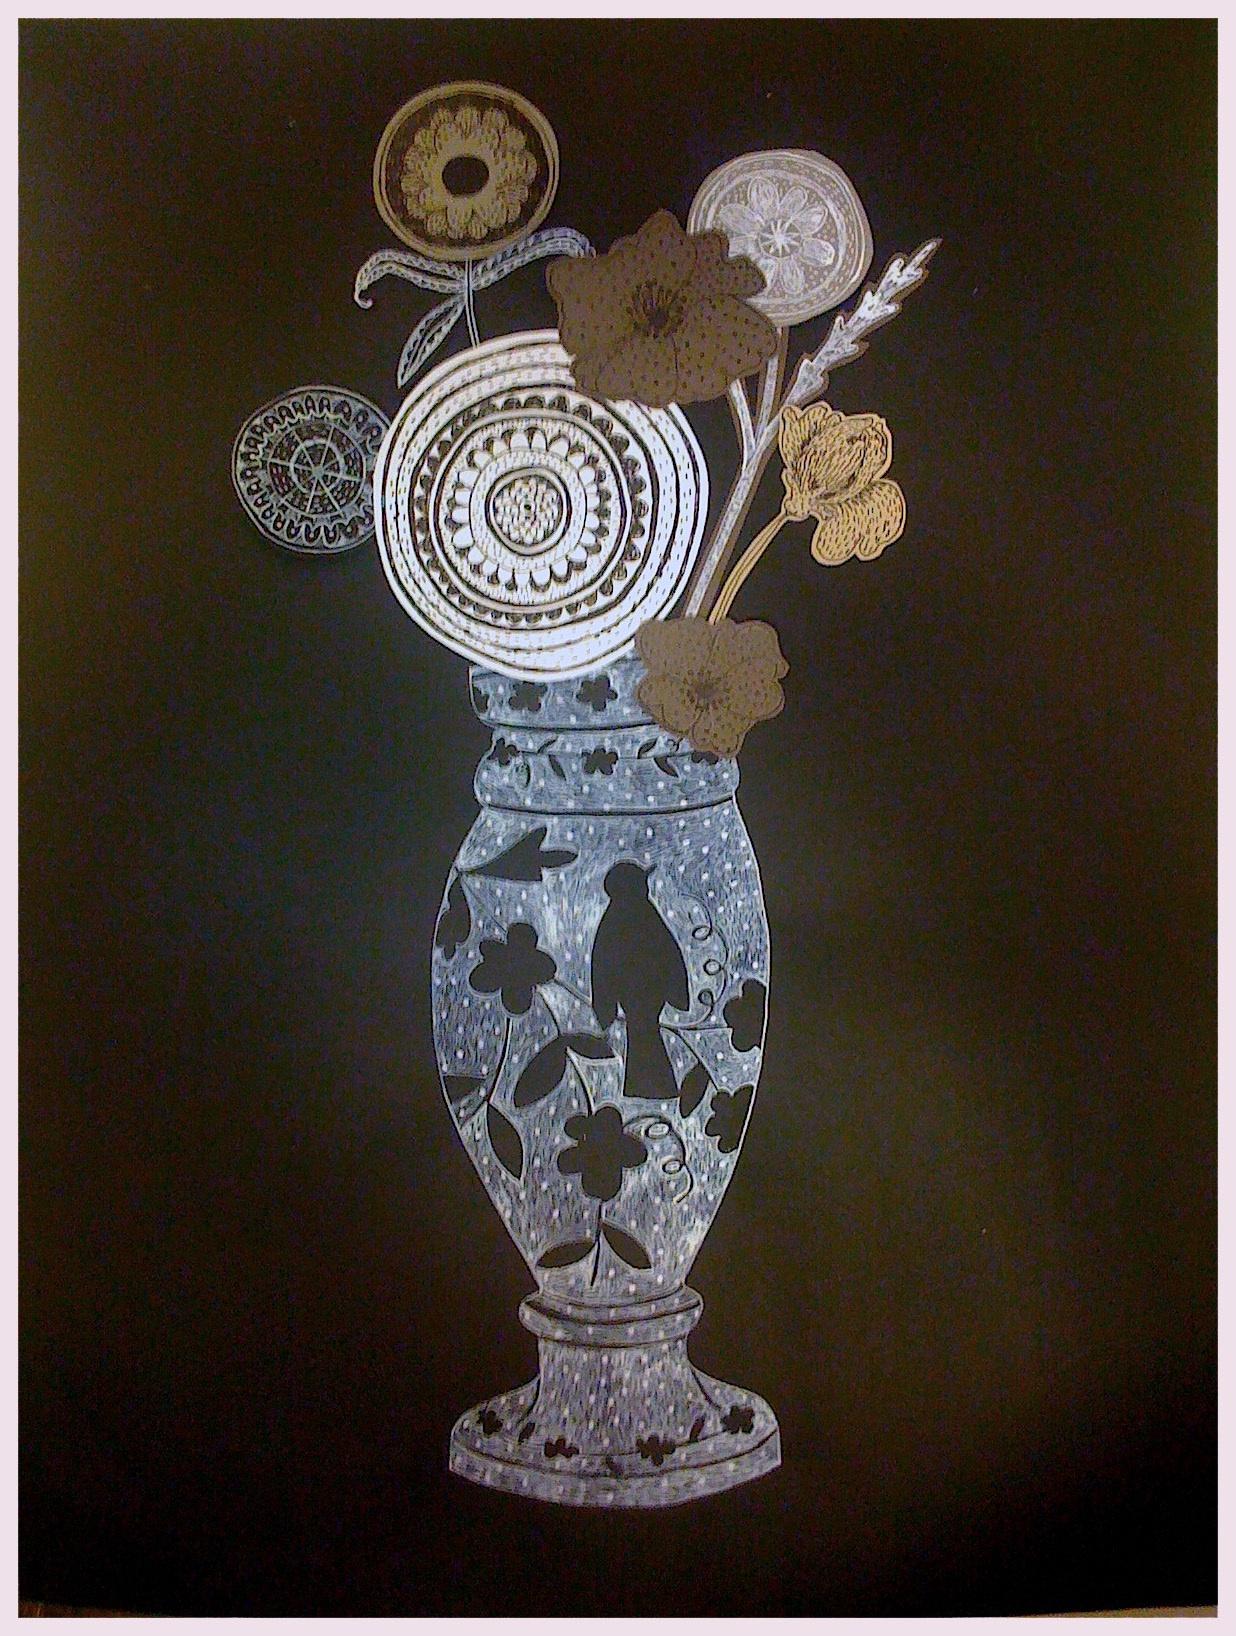 vase with bird.jpg